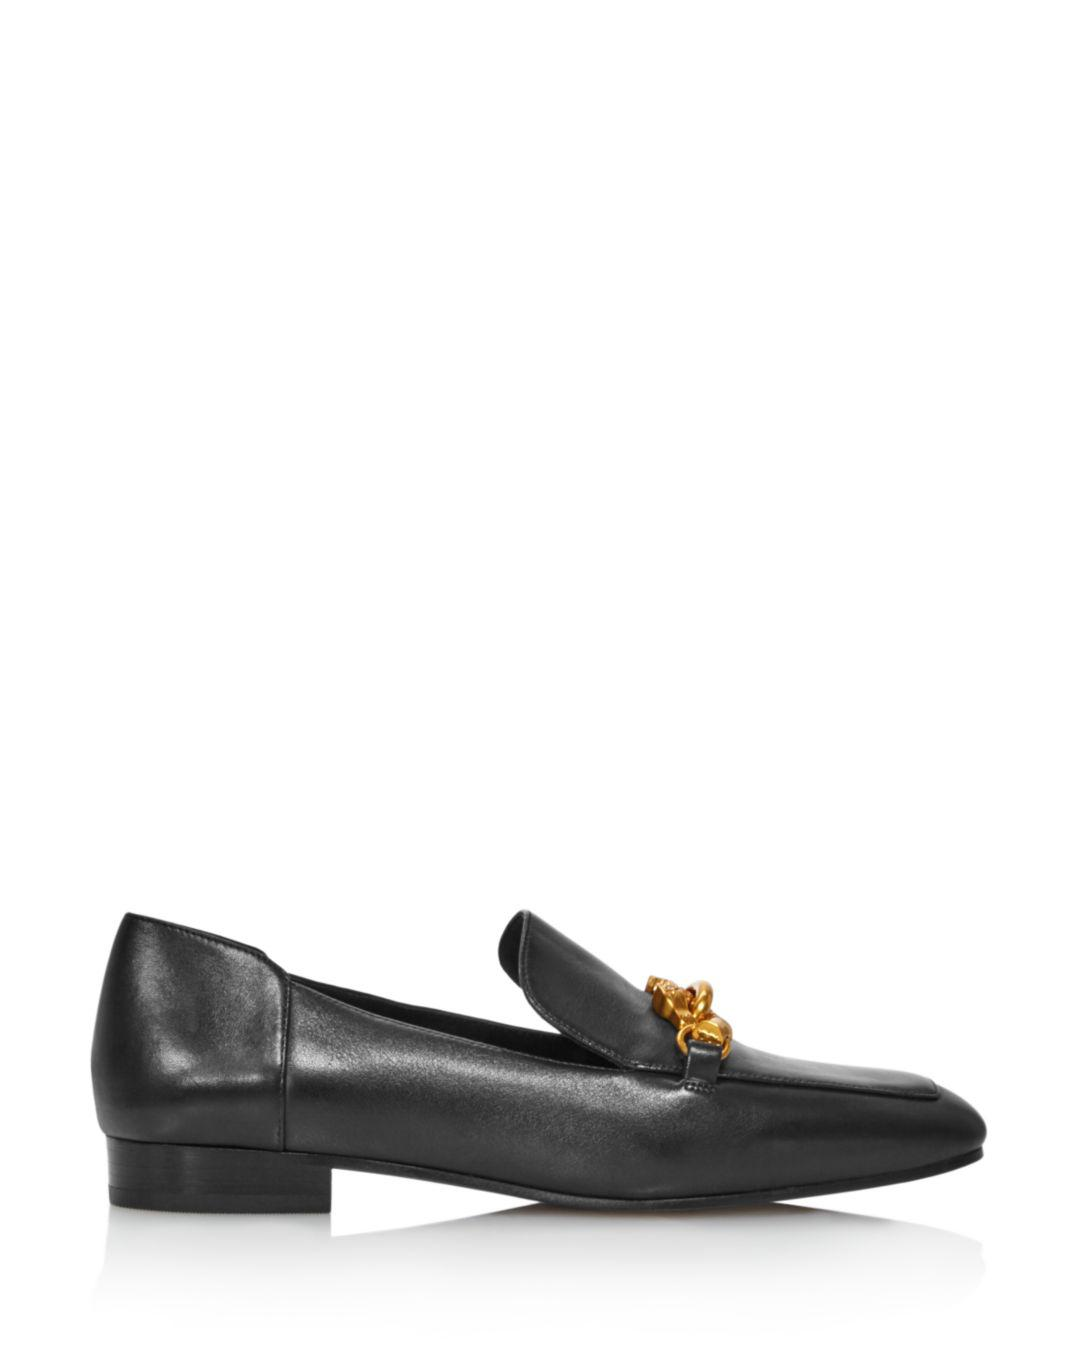 00454666edf Lyst - Tory Burch Women s Jessa Almond-toe Leather Loafers in Black - Save  33%